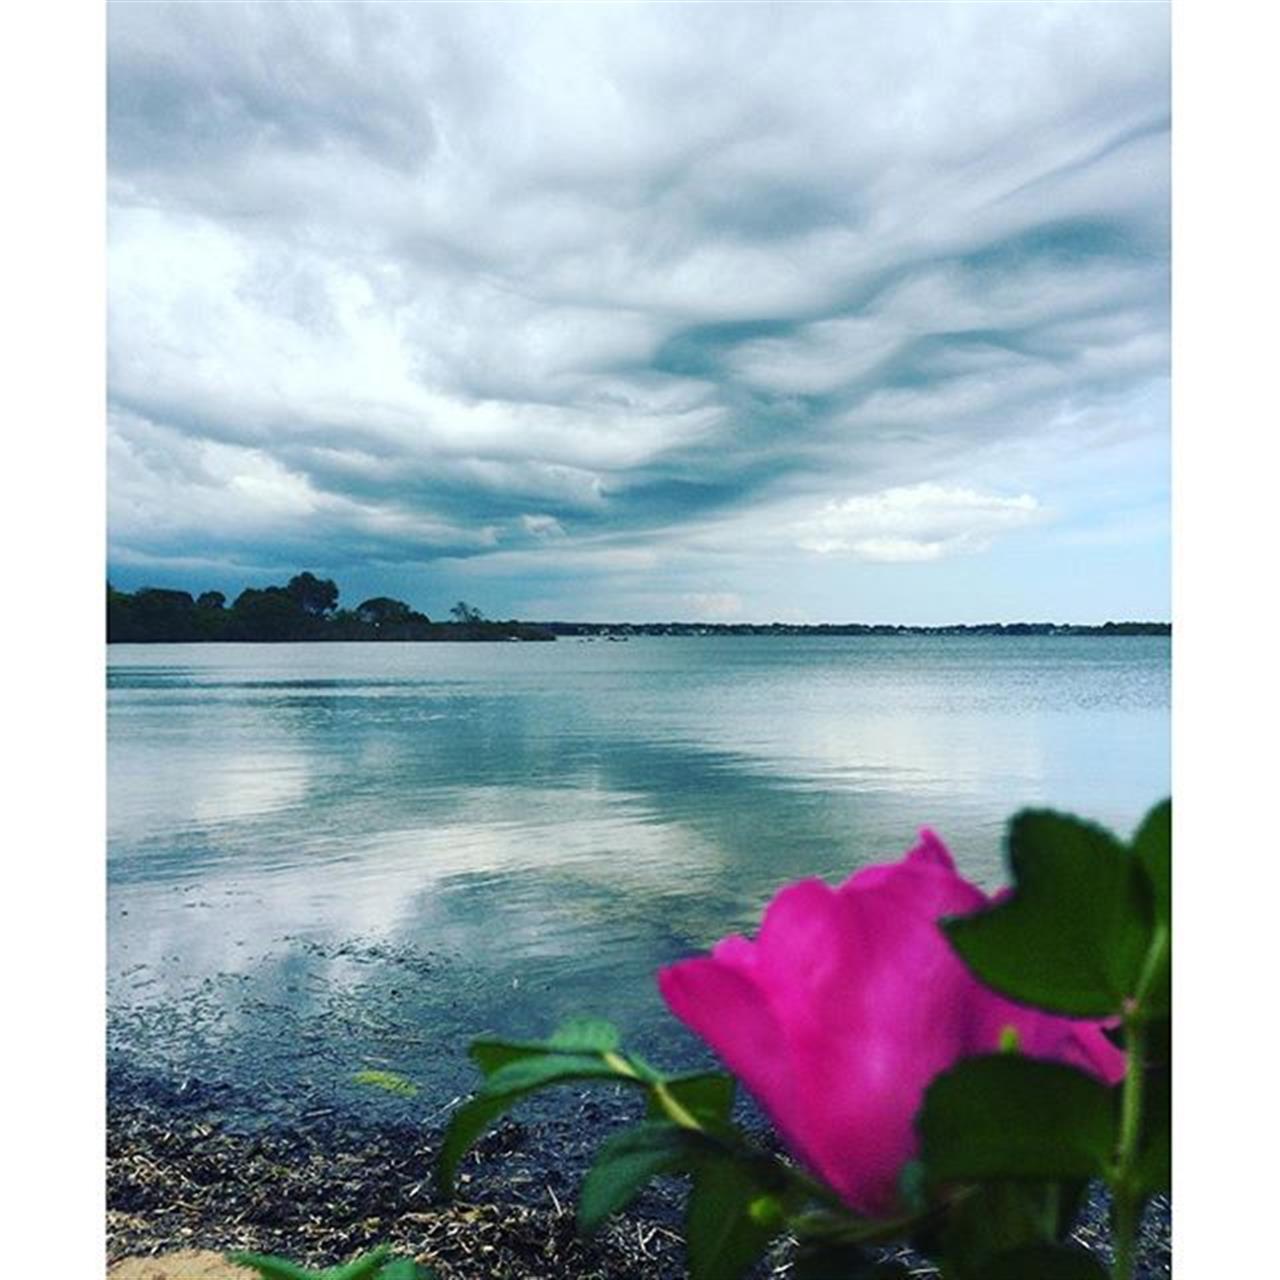 Beauty watching the approaching storm #rhodeisland